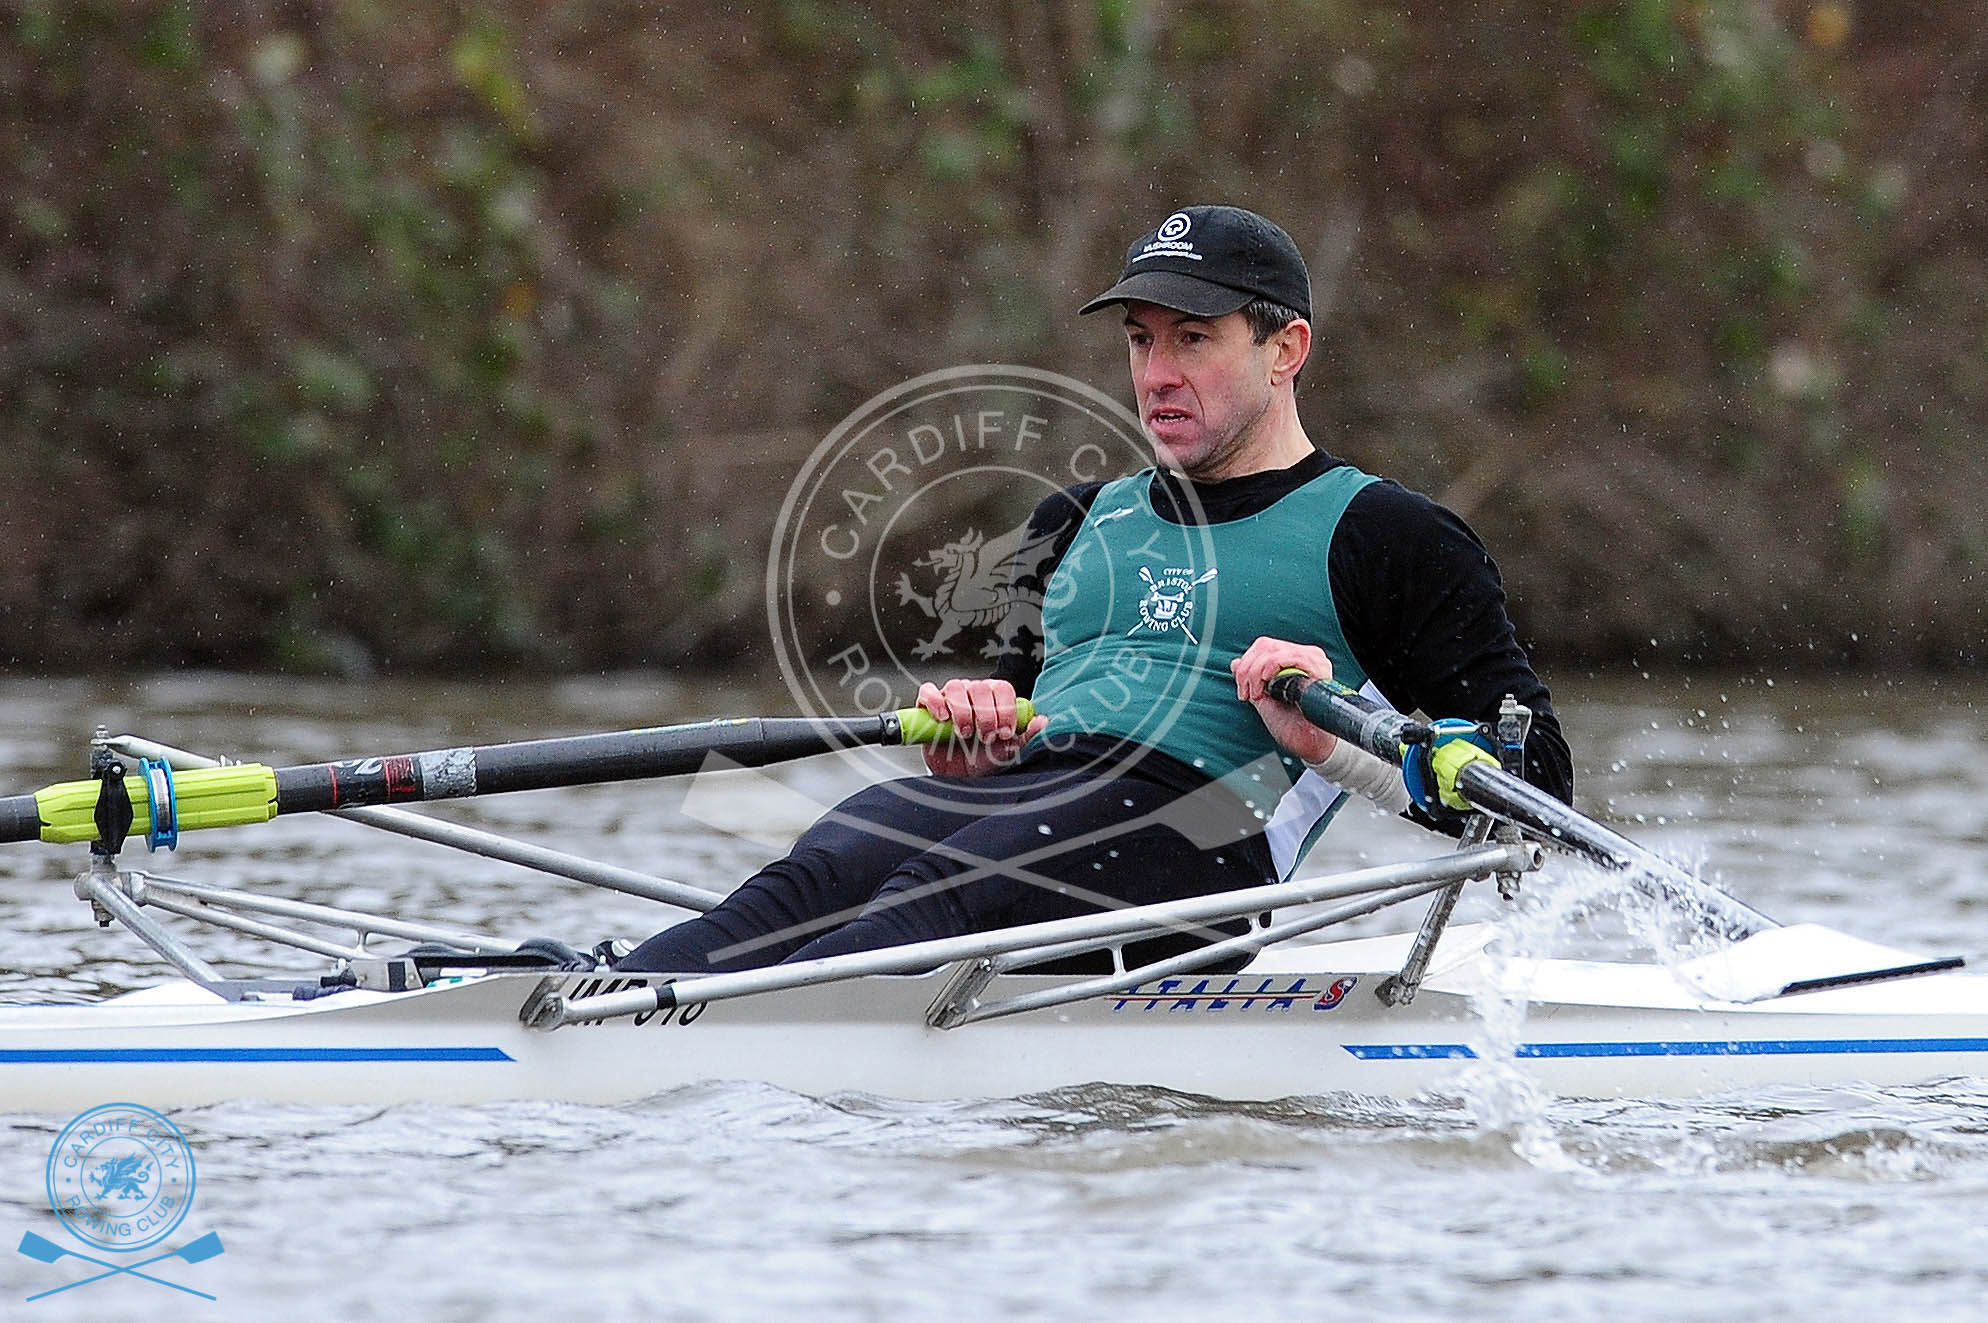 DW_280119_Cardiff_City_Rowing_292.jpg